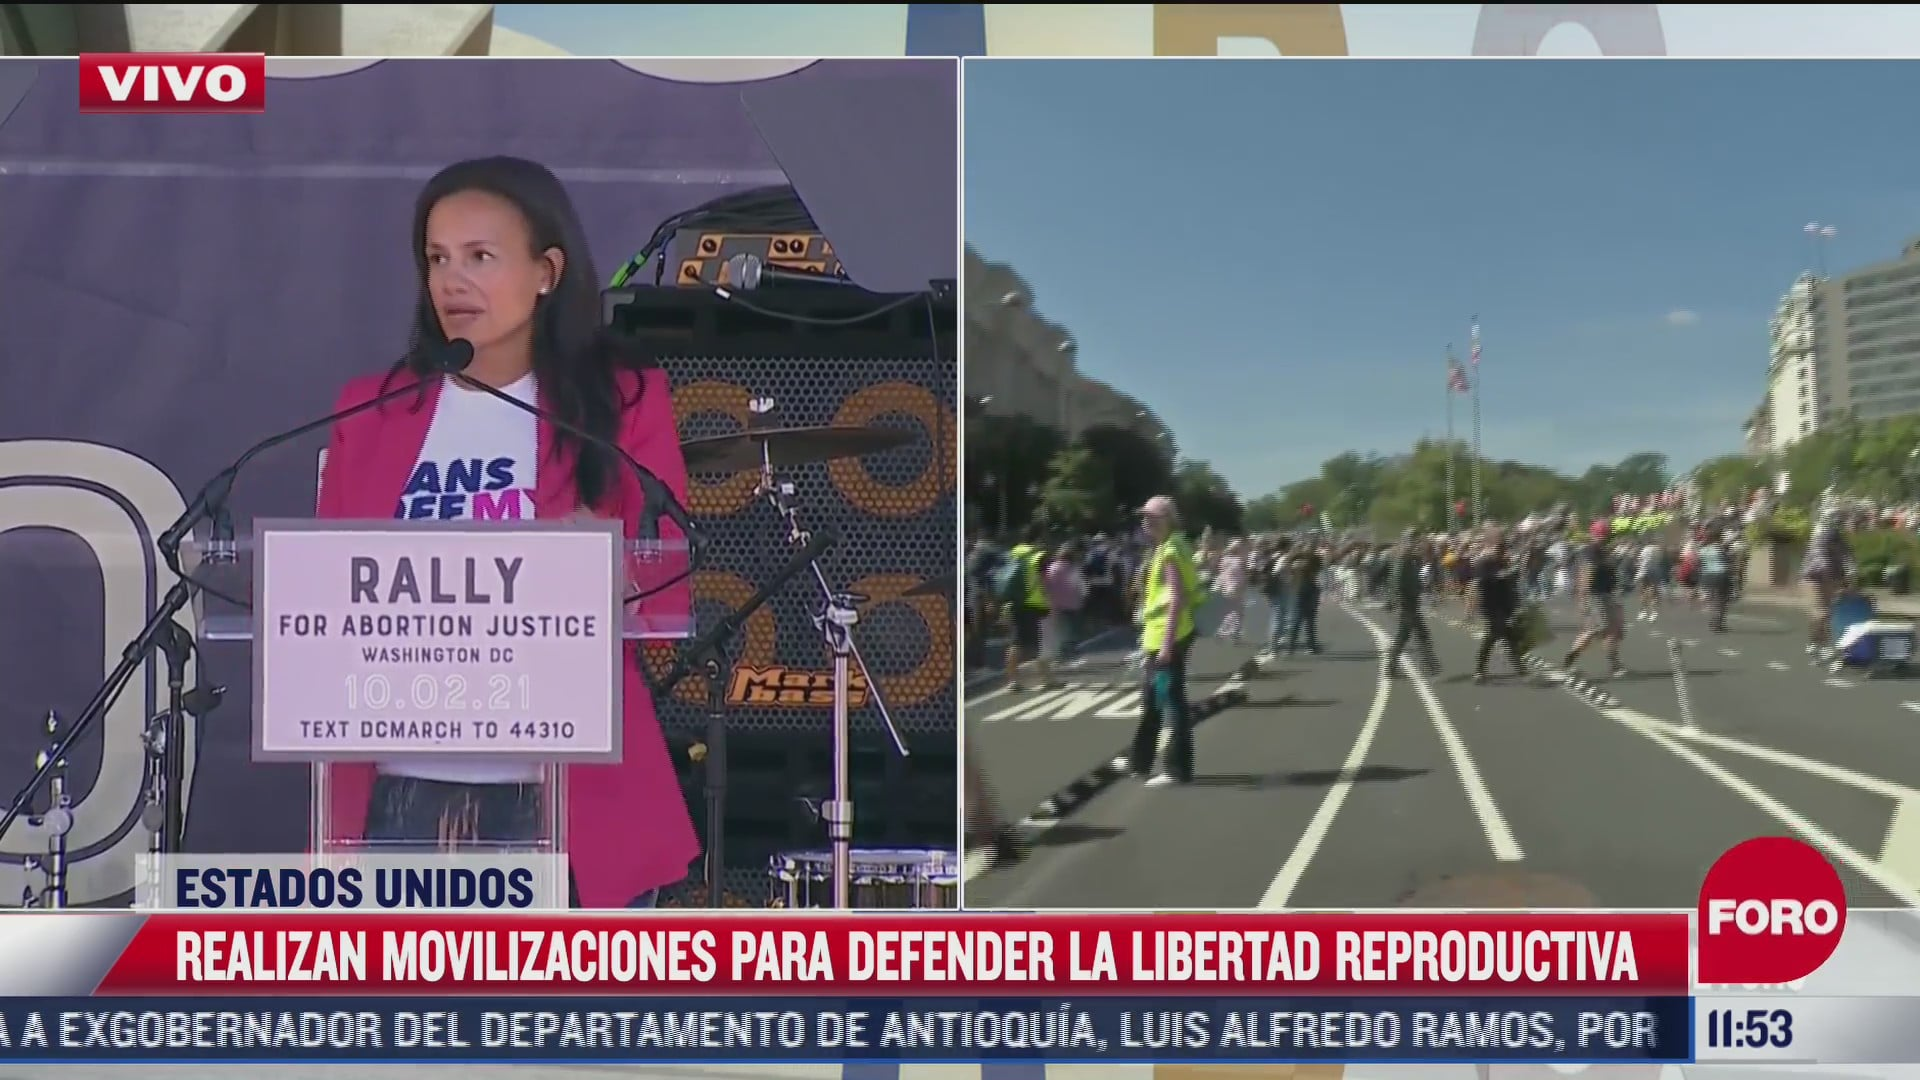 se movilizan en eeuu para defender la libertad reproductiva